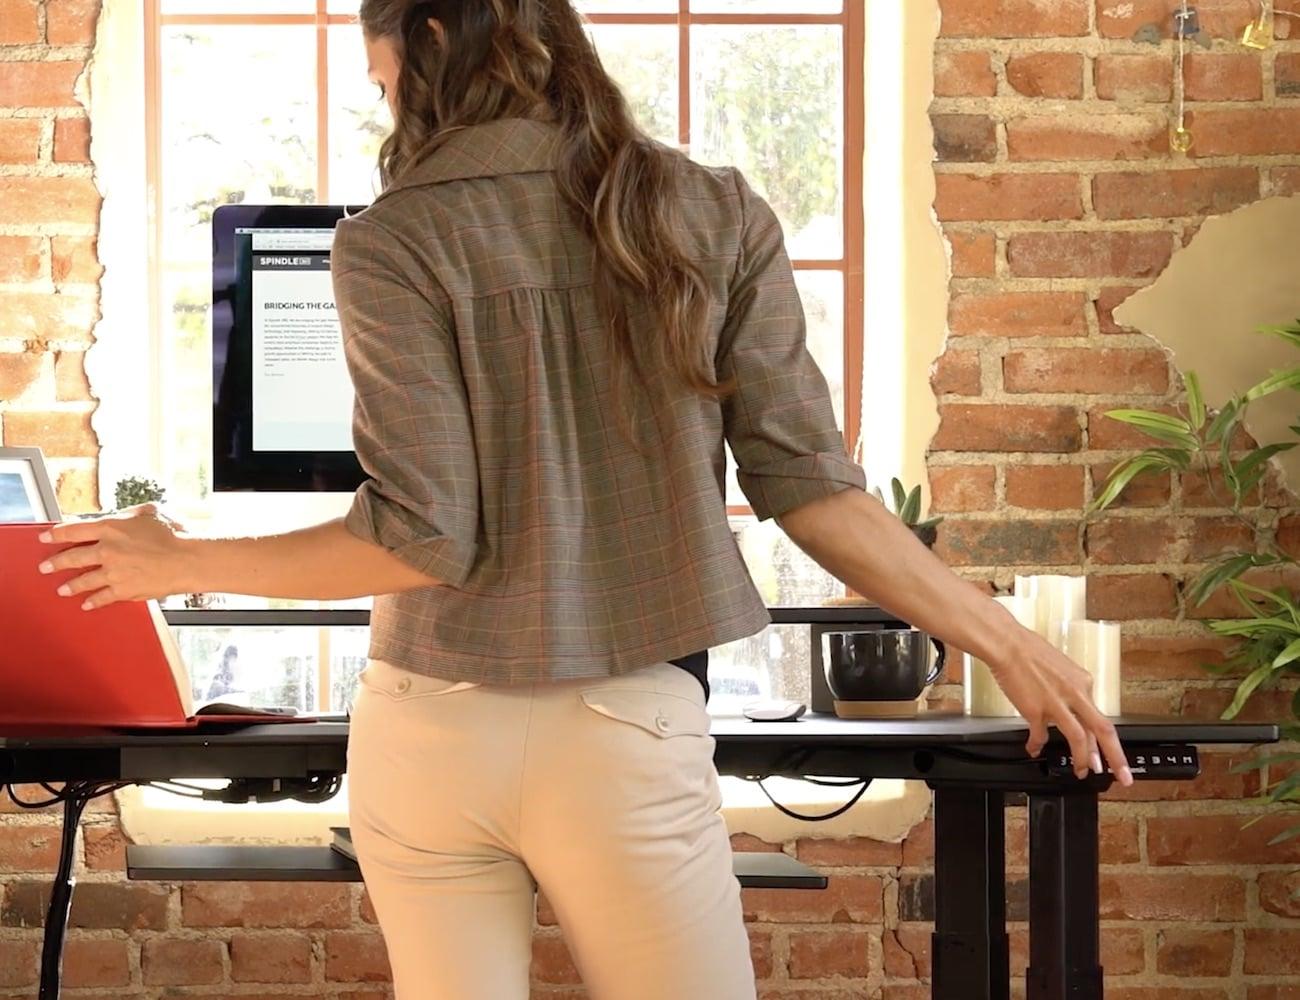 EvoDesk Electronic Height Adjustable Desk